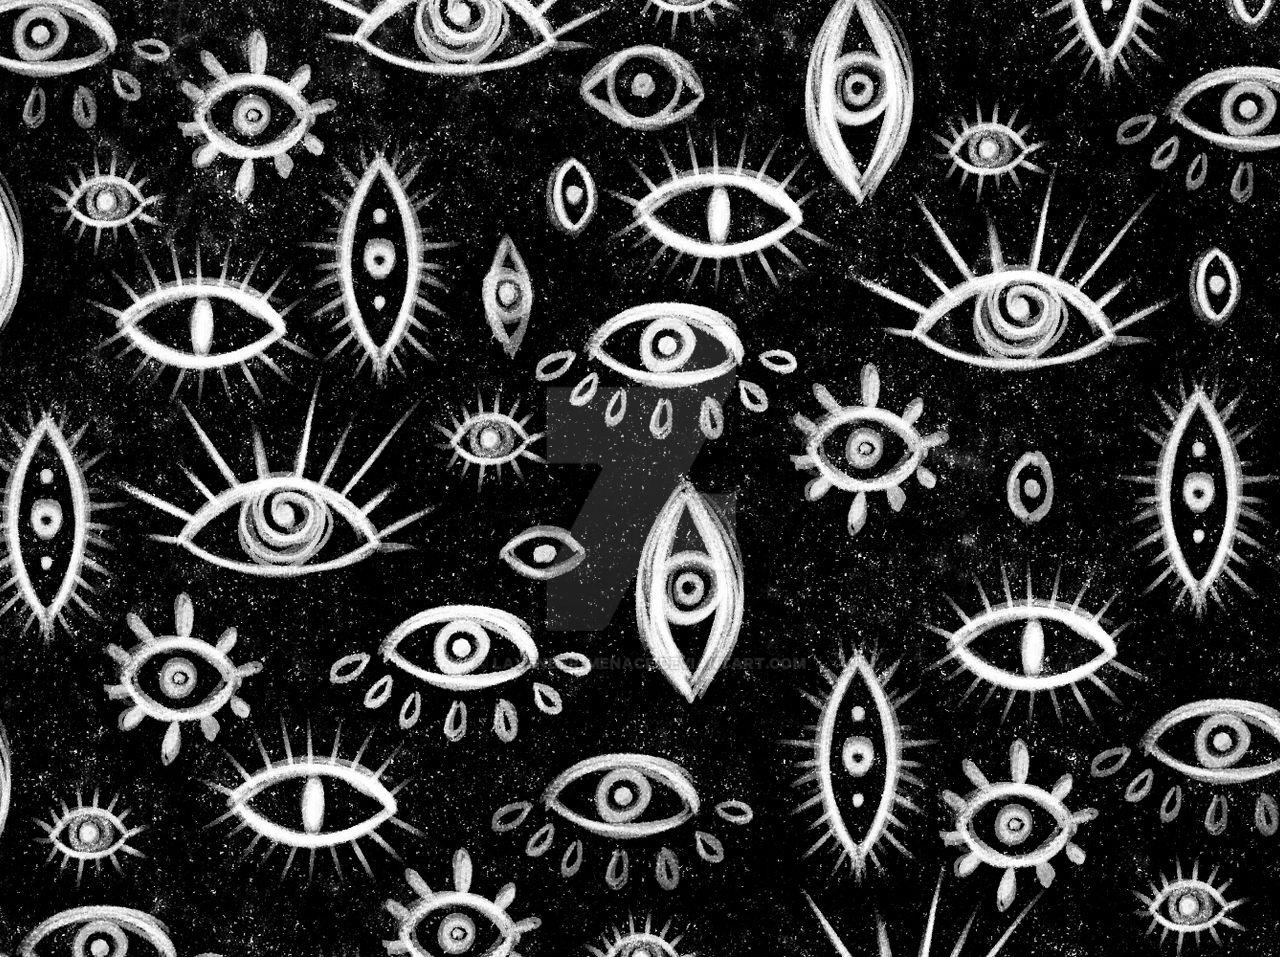 Pattern: Eyes